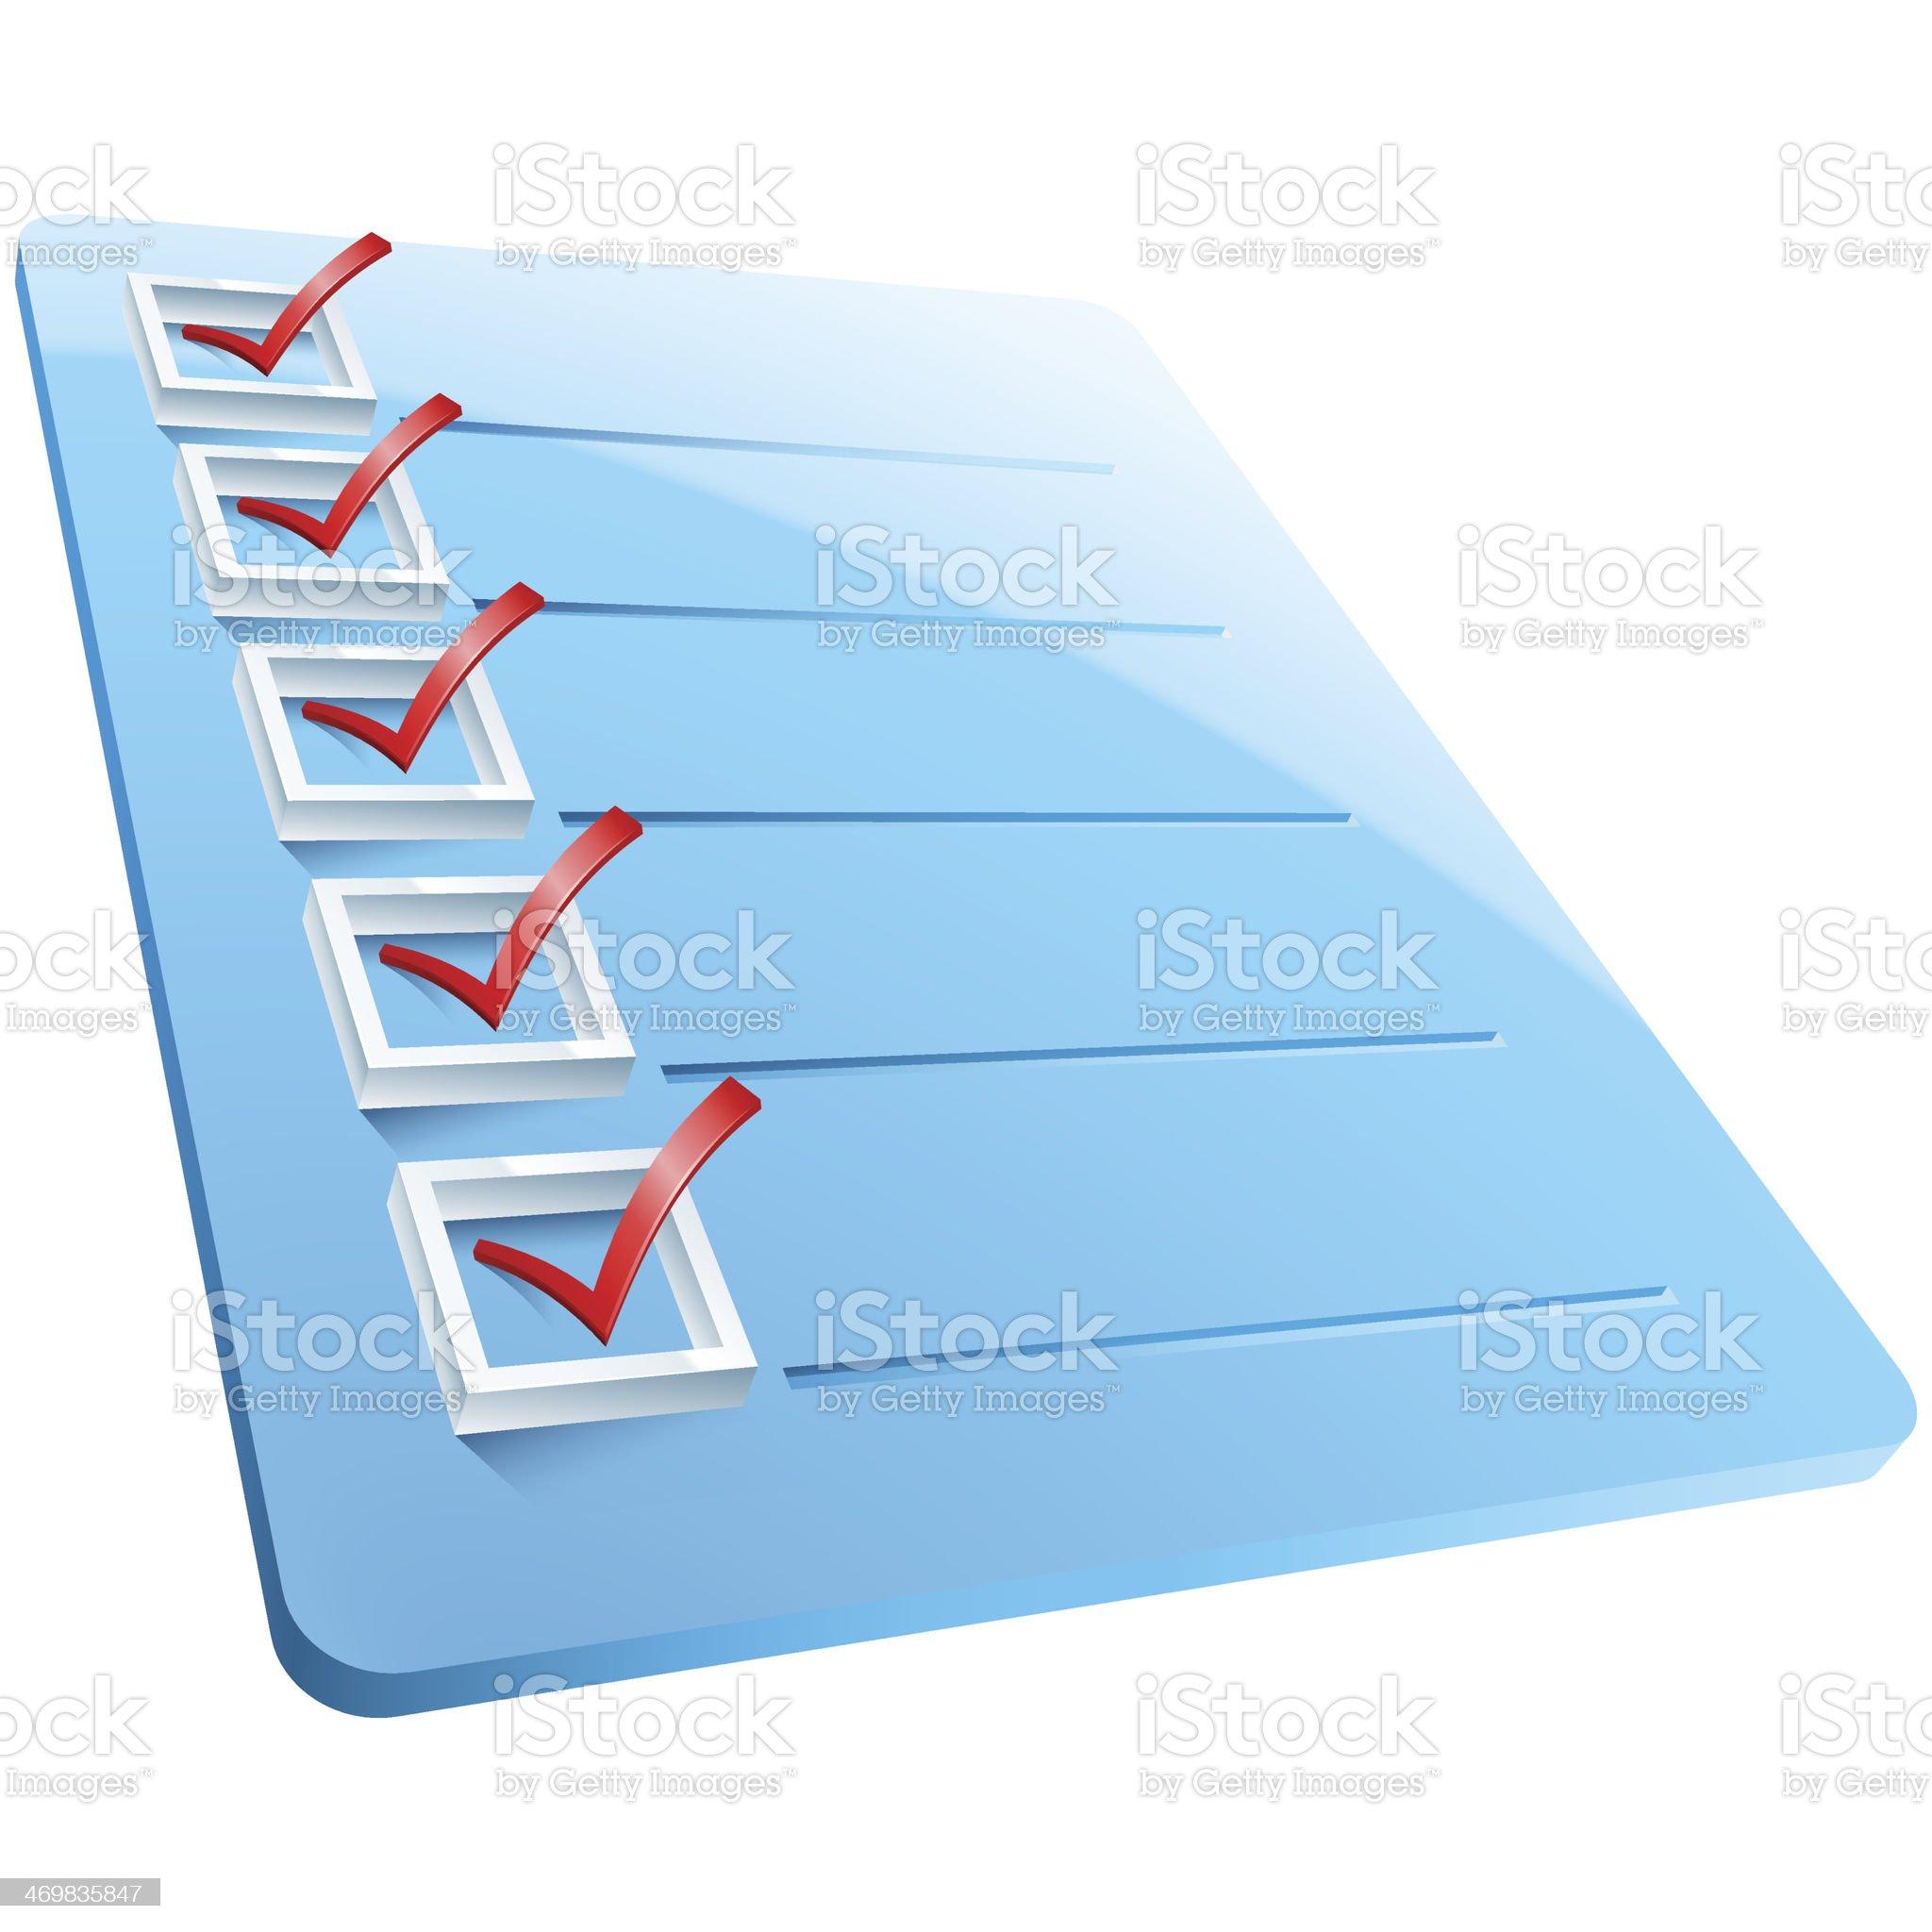 Checkmarks Board royalty-free stock vector art